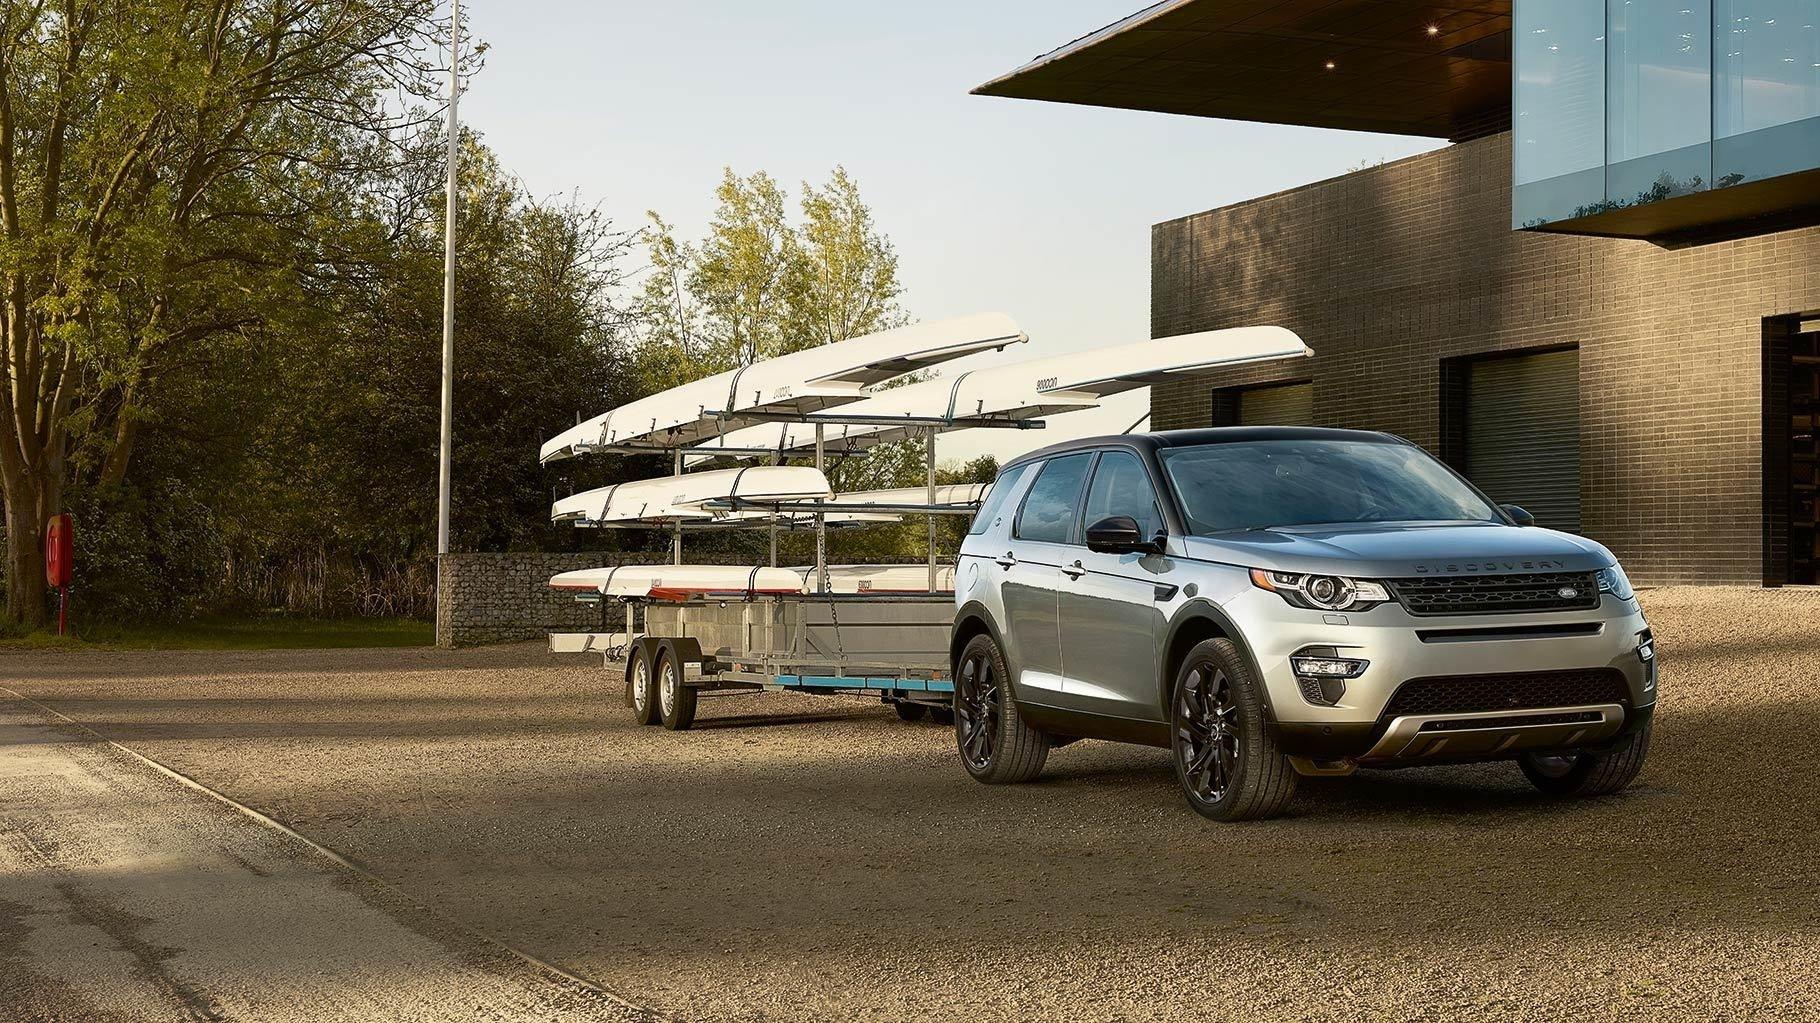 Land Rover Discovery Sport Exterior 3